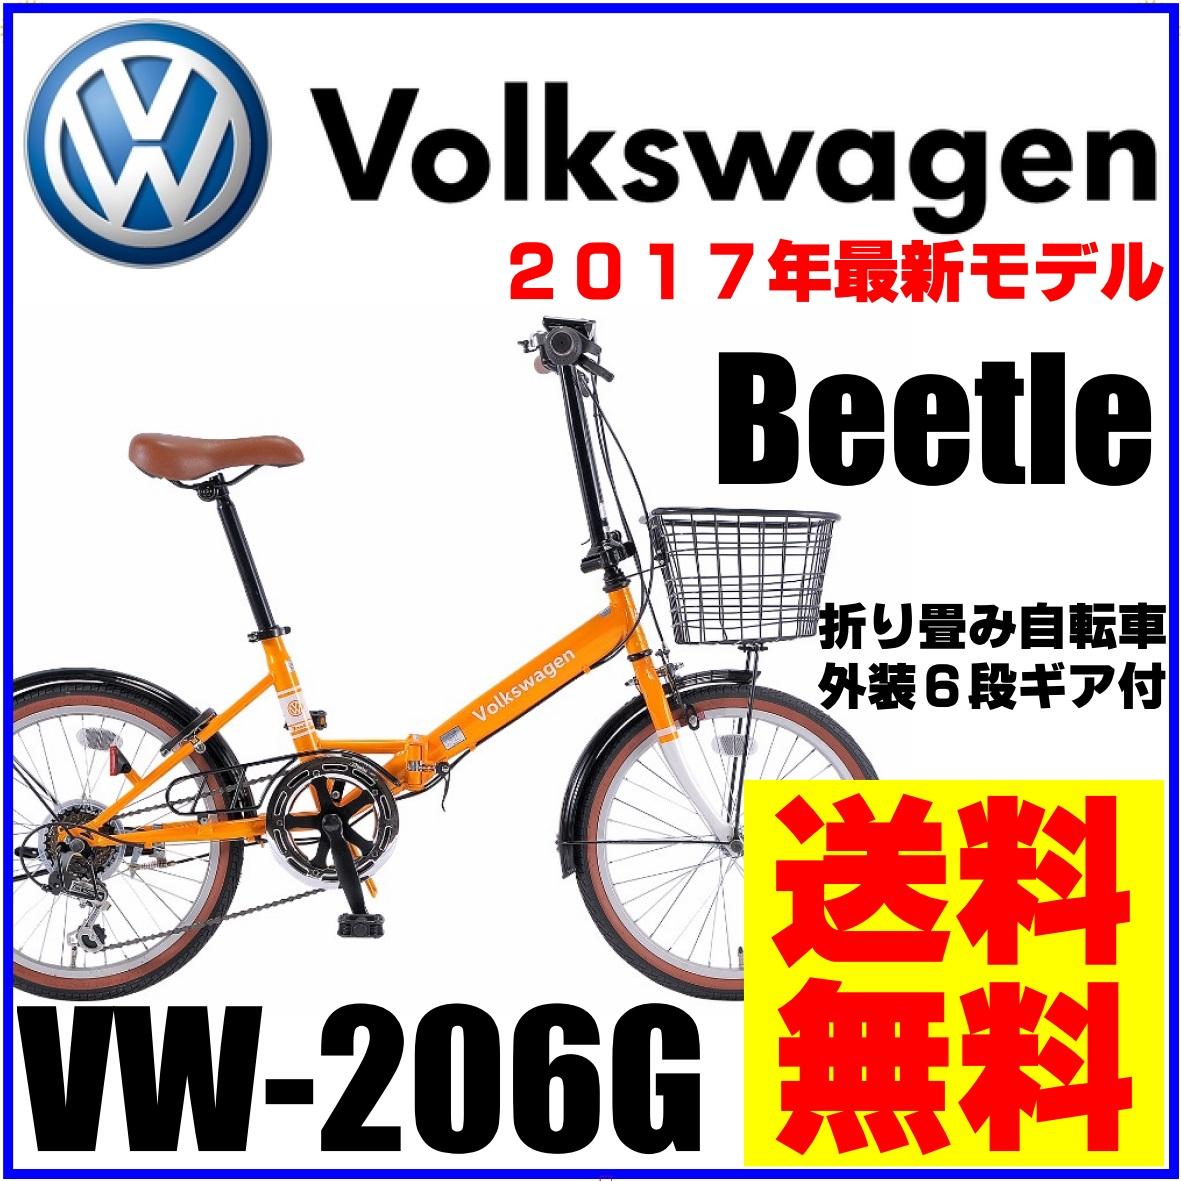 BAA 折りたたみ 自転車 フォルクスワーゲン Volkswagen 自転車 オレンジ 20インチ 自転車 外装6段ギア フォルクスワーゲン VW-206G Beetle ビートル